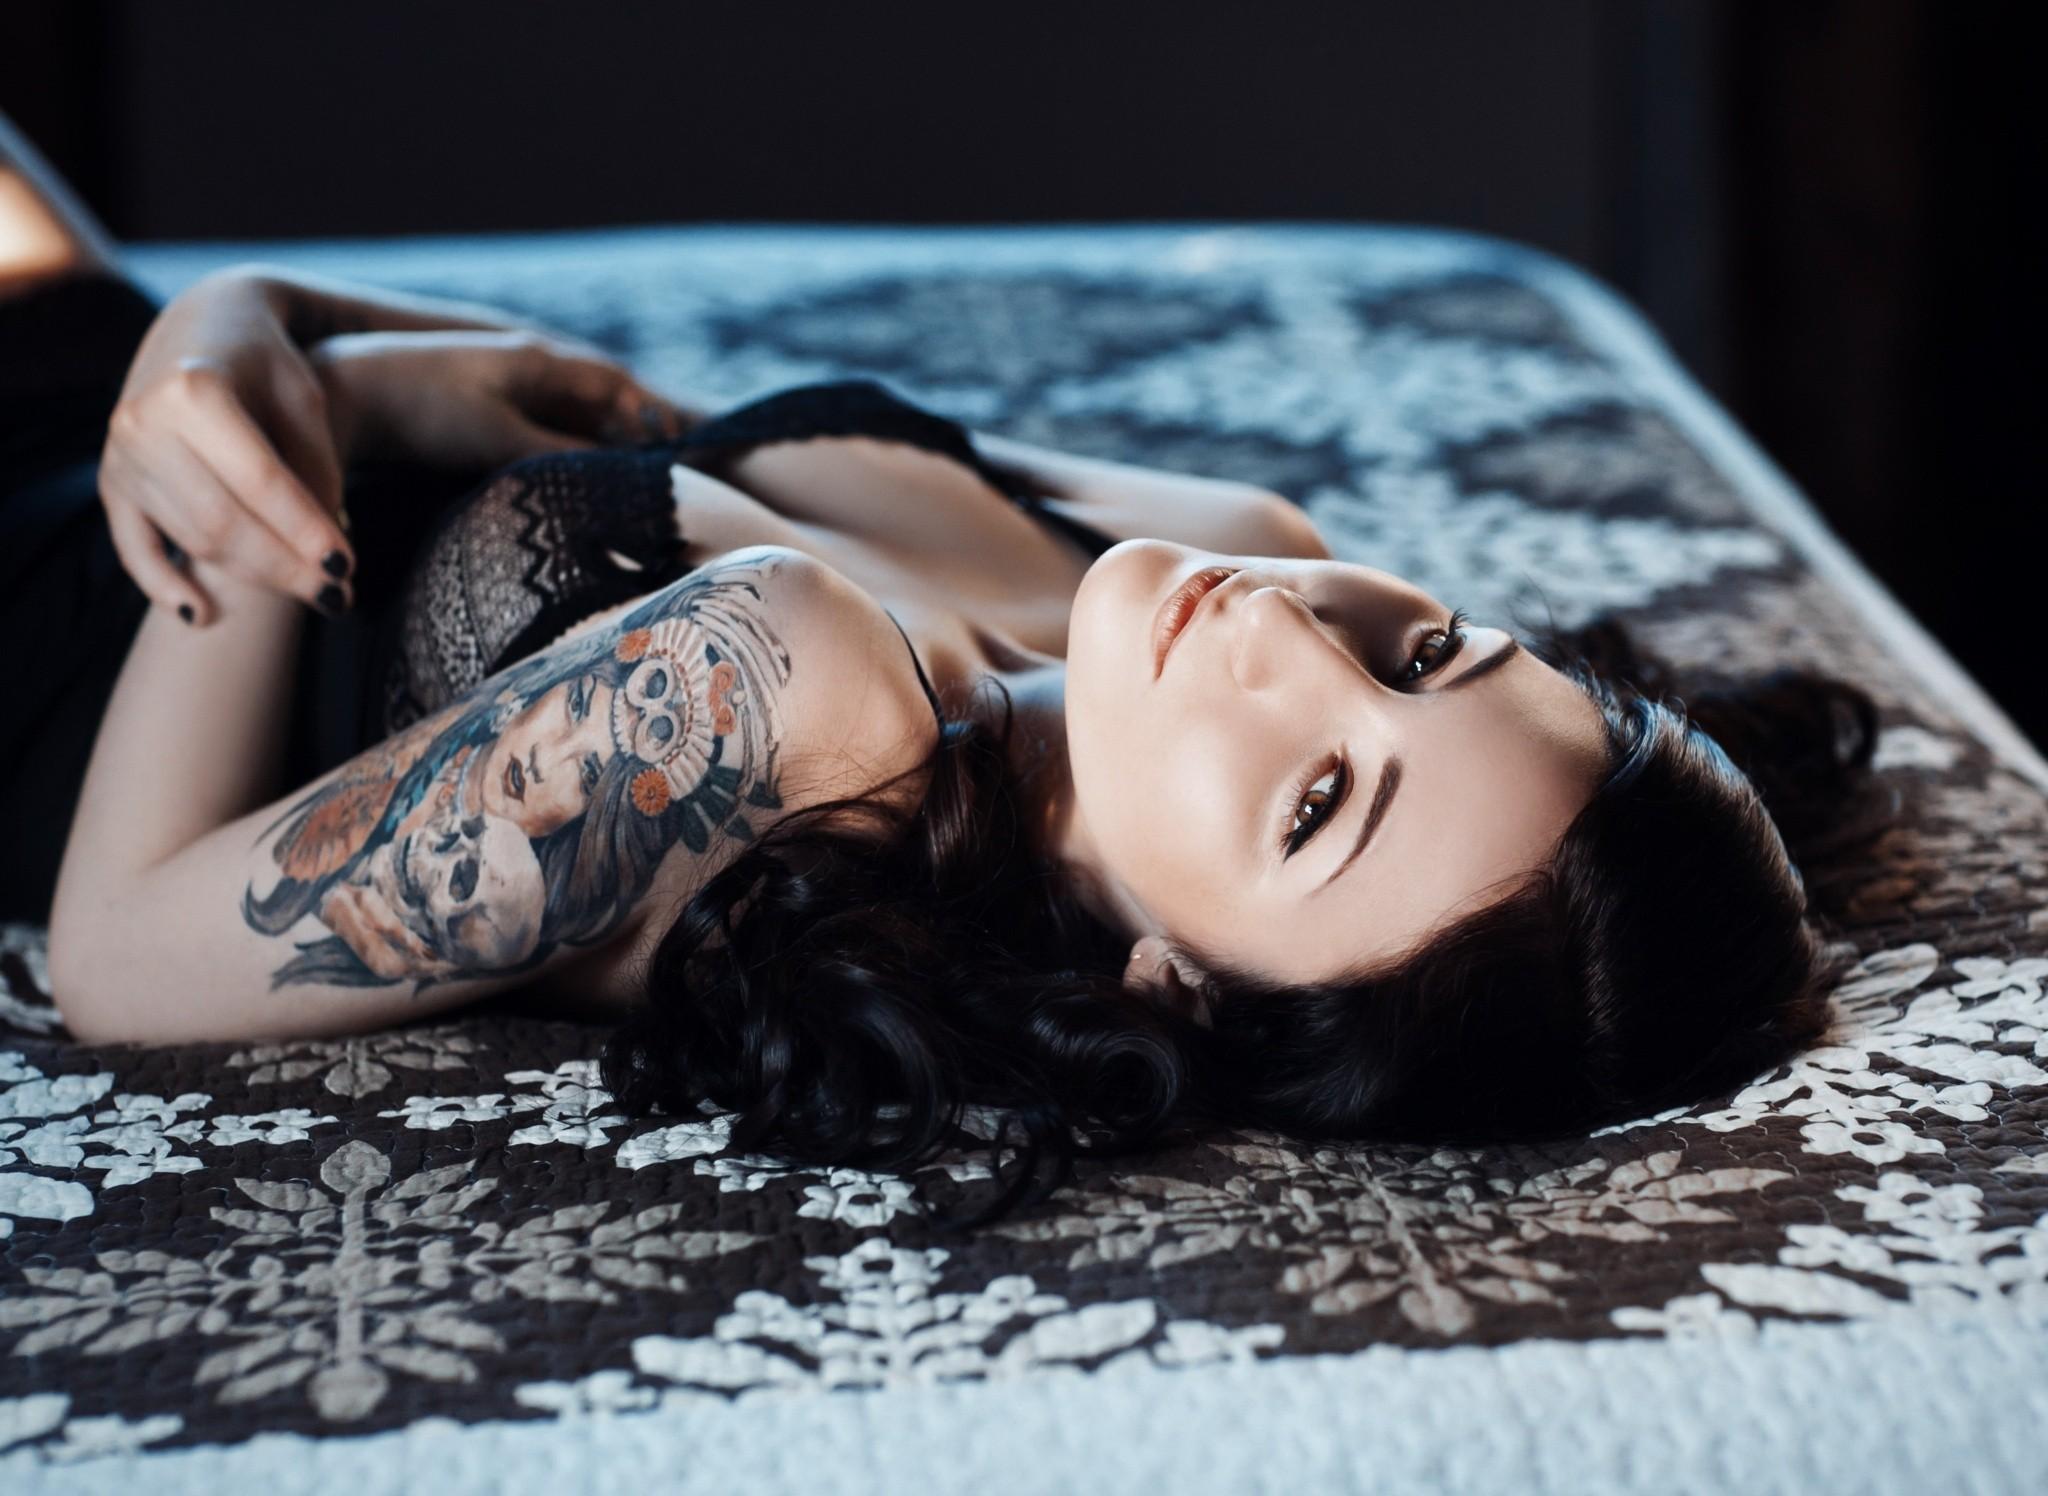 People 2048x1496 women model brunette brown eyes lingerie tattoo Alyssa Framm cleavage